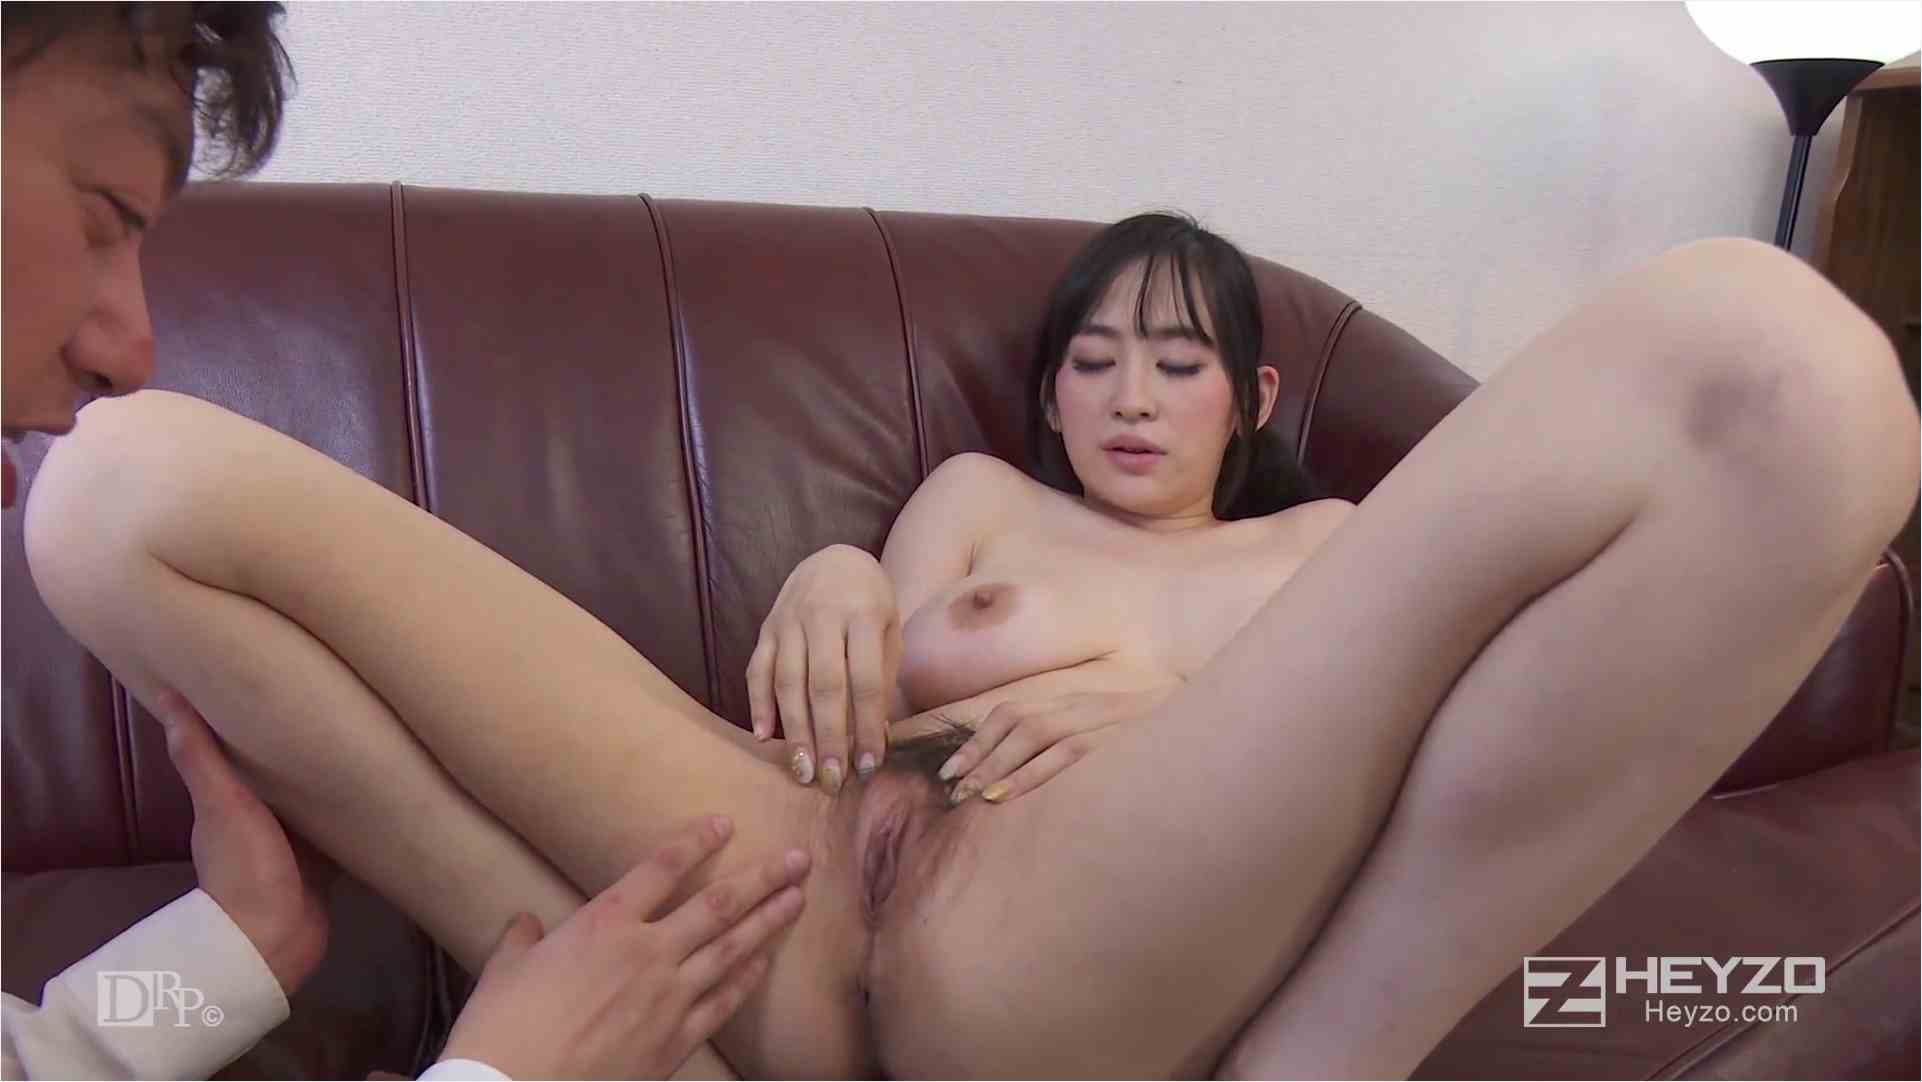 Heyzo-1235-他人妻味~程良く熟れた食べごろボディ~